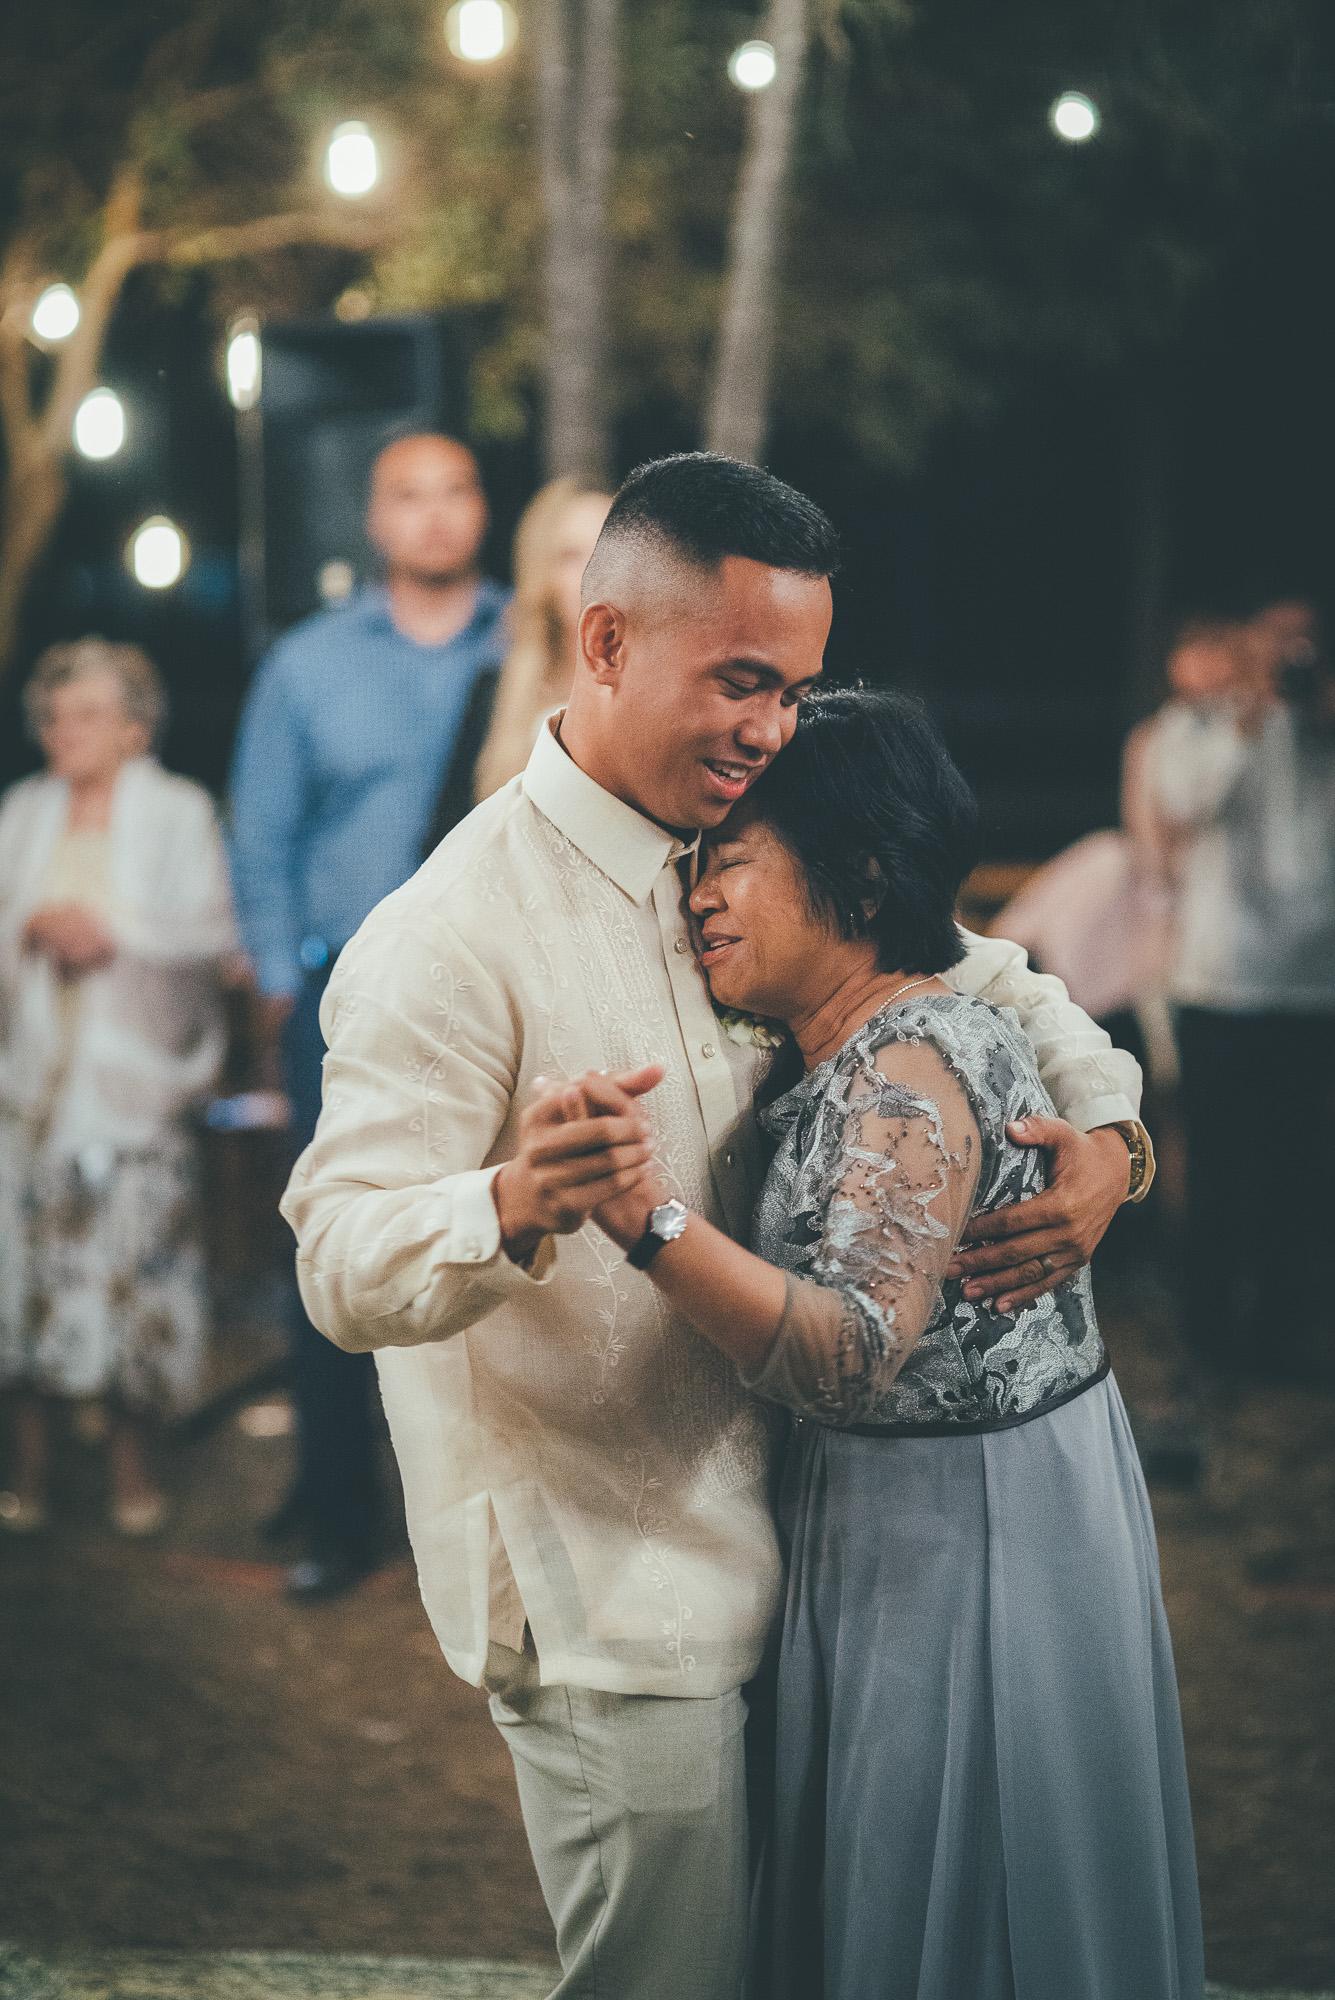 wedding-photographer-outdoor-casual-styled-los-angeles-australia-california-international-earthbound -97.jpg